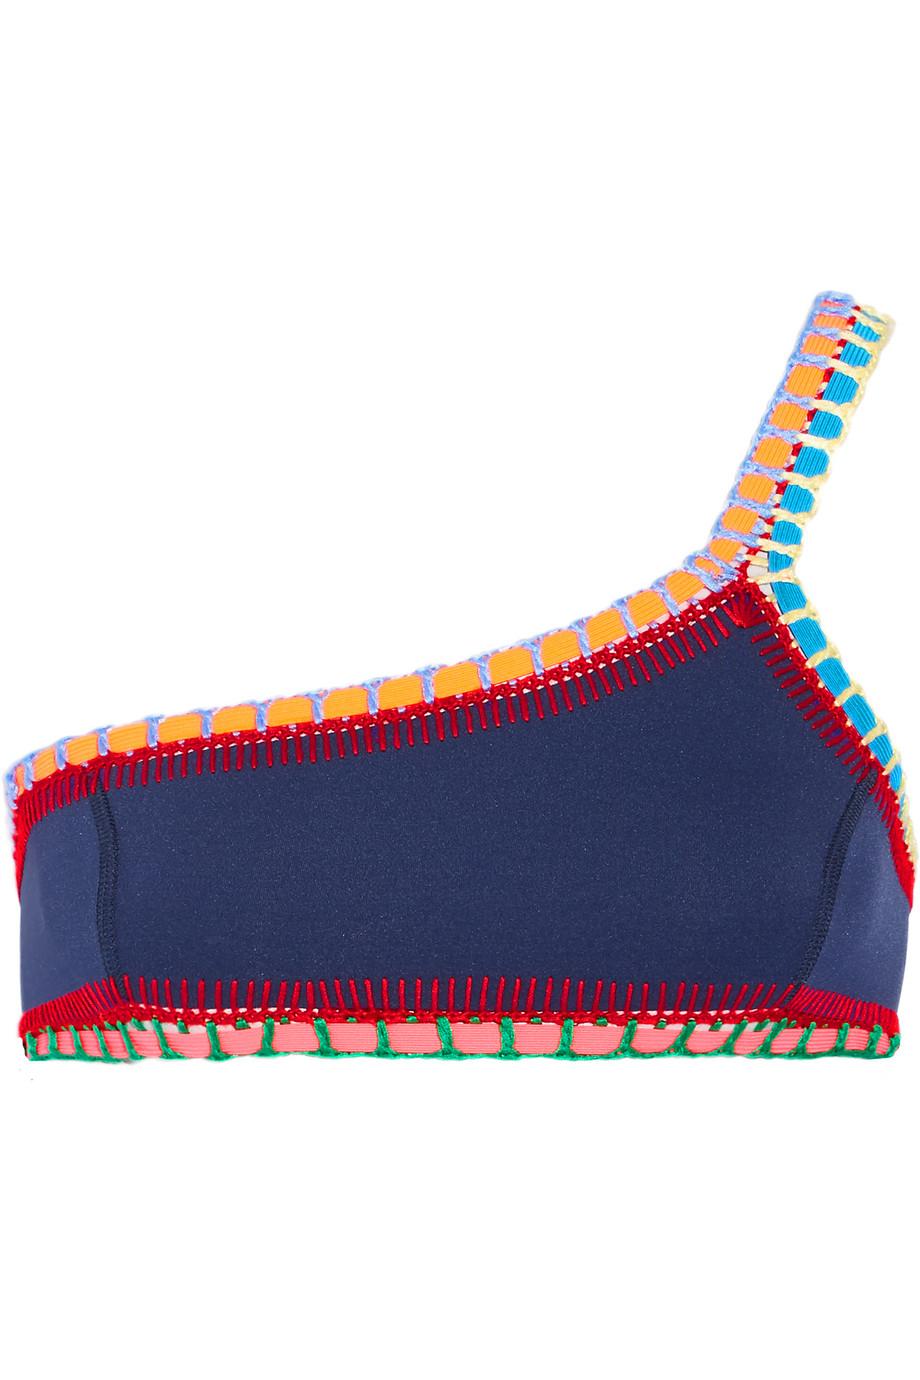 Tasmin Crochet-Trimmed Bikini Top, Navy, Women's, Size: S